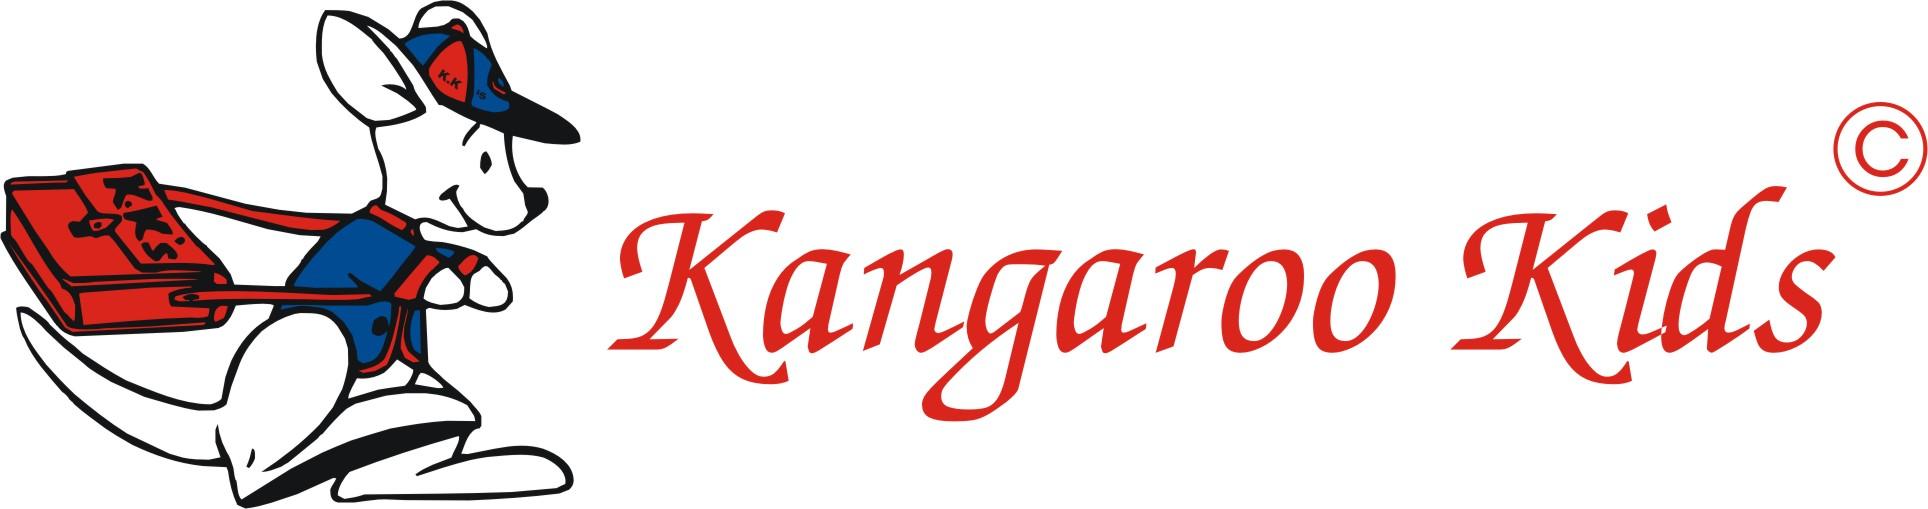 Kangaroo Kids - Sector 34 - Noida Image